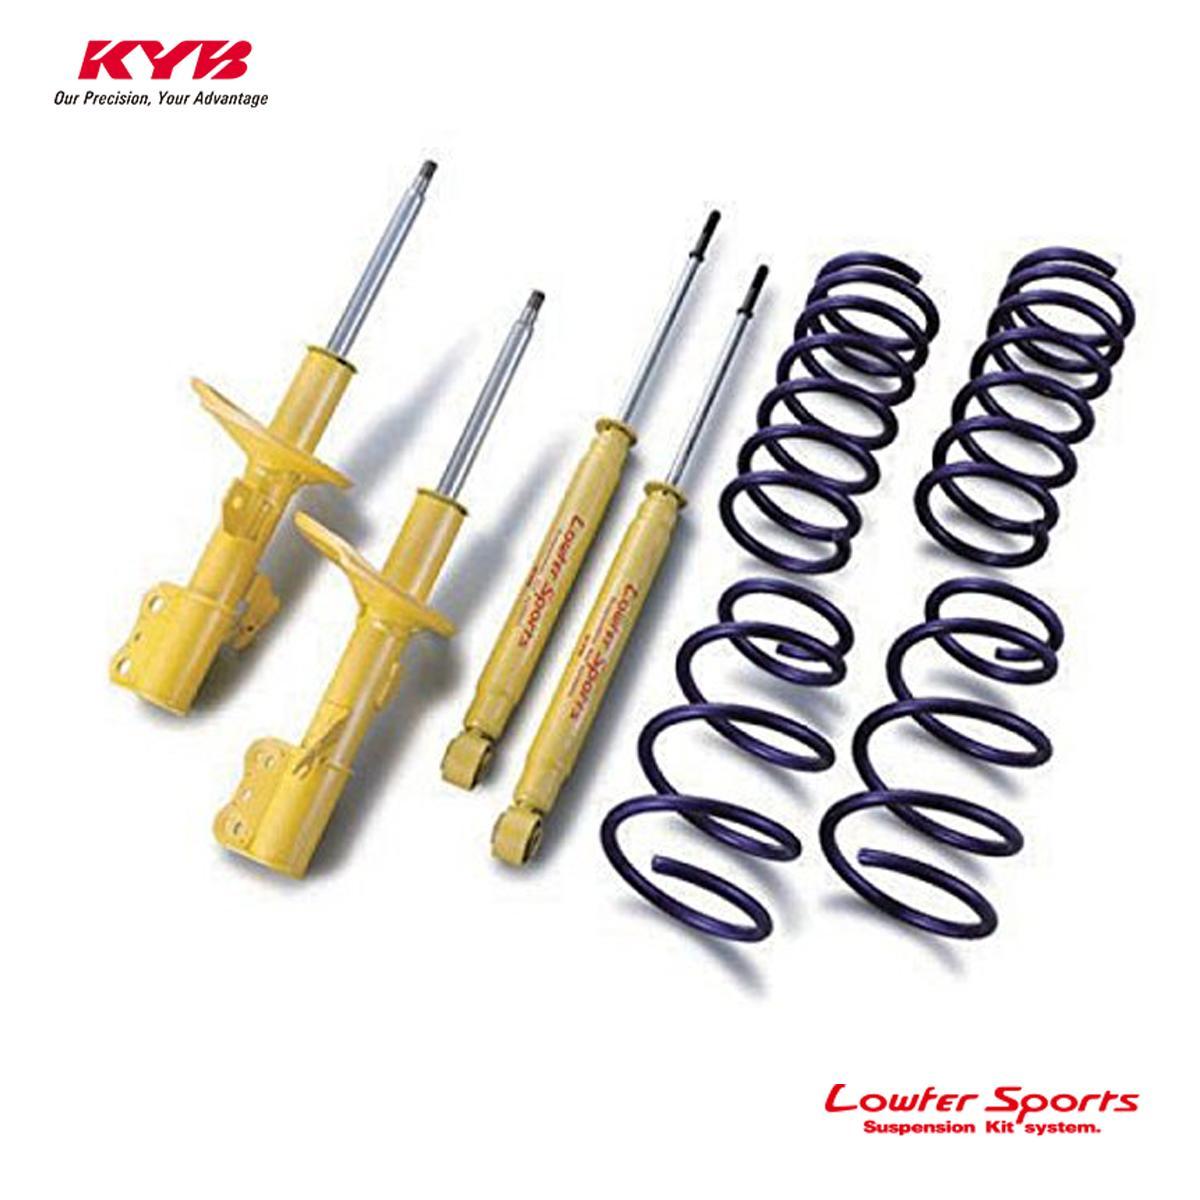 KYB カヤバ カムリ AVV50 ショックアブソーバー サスペンションキット Lowfer Sports LKIT-AVV50 配送先条件有り